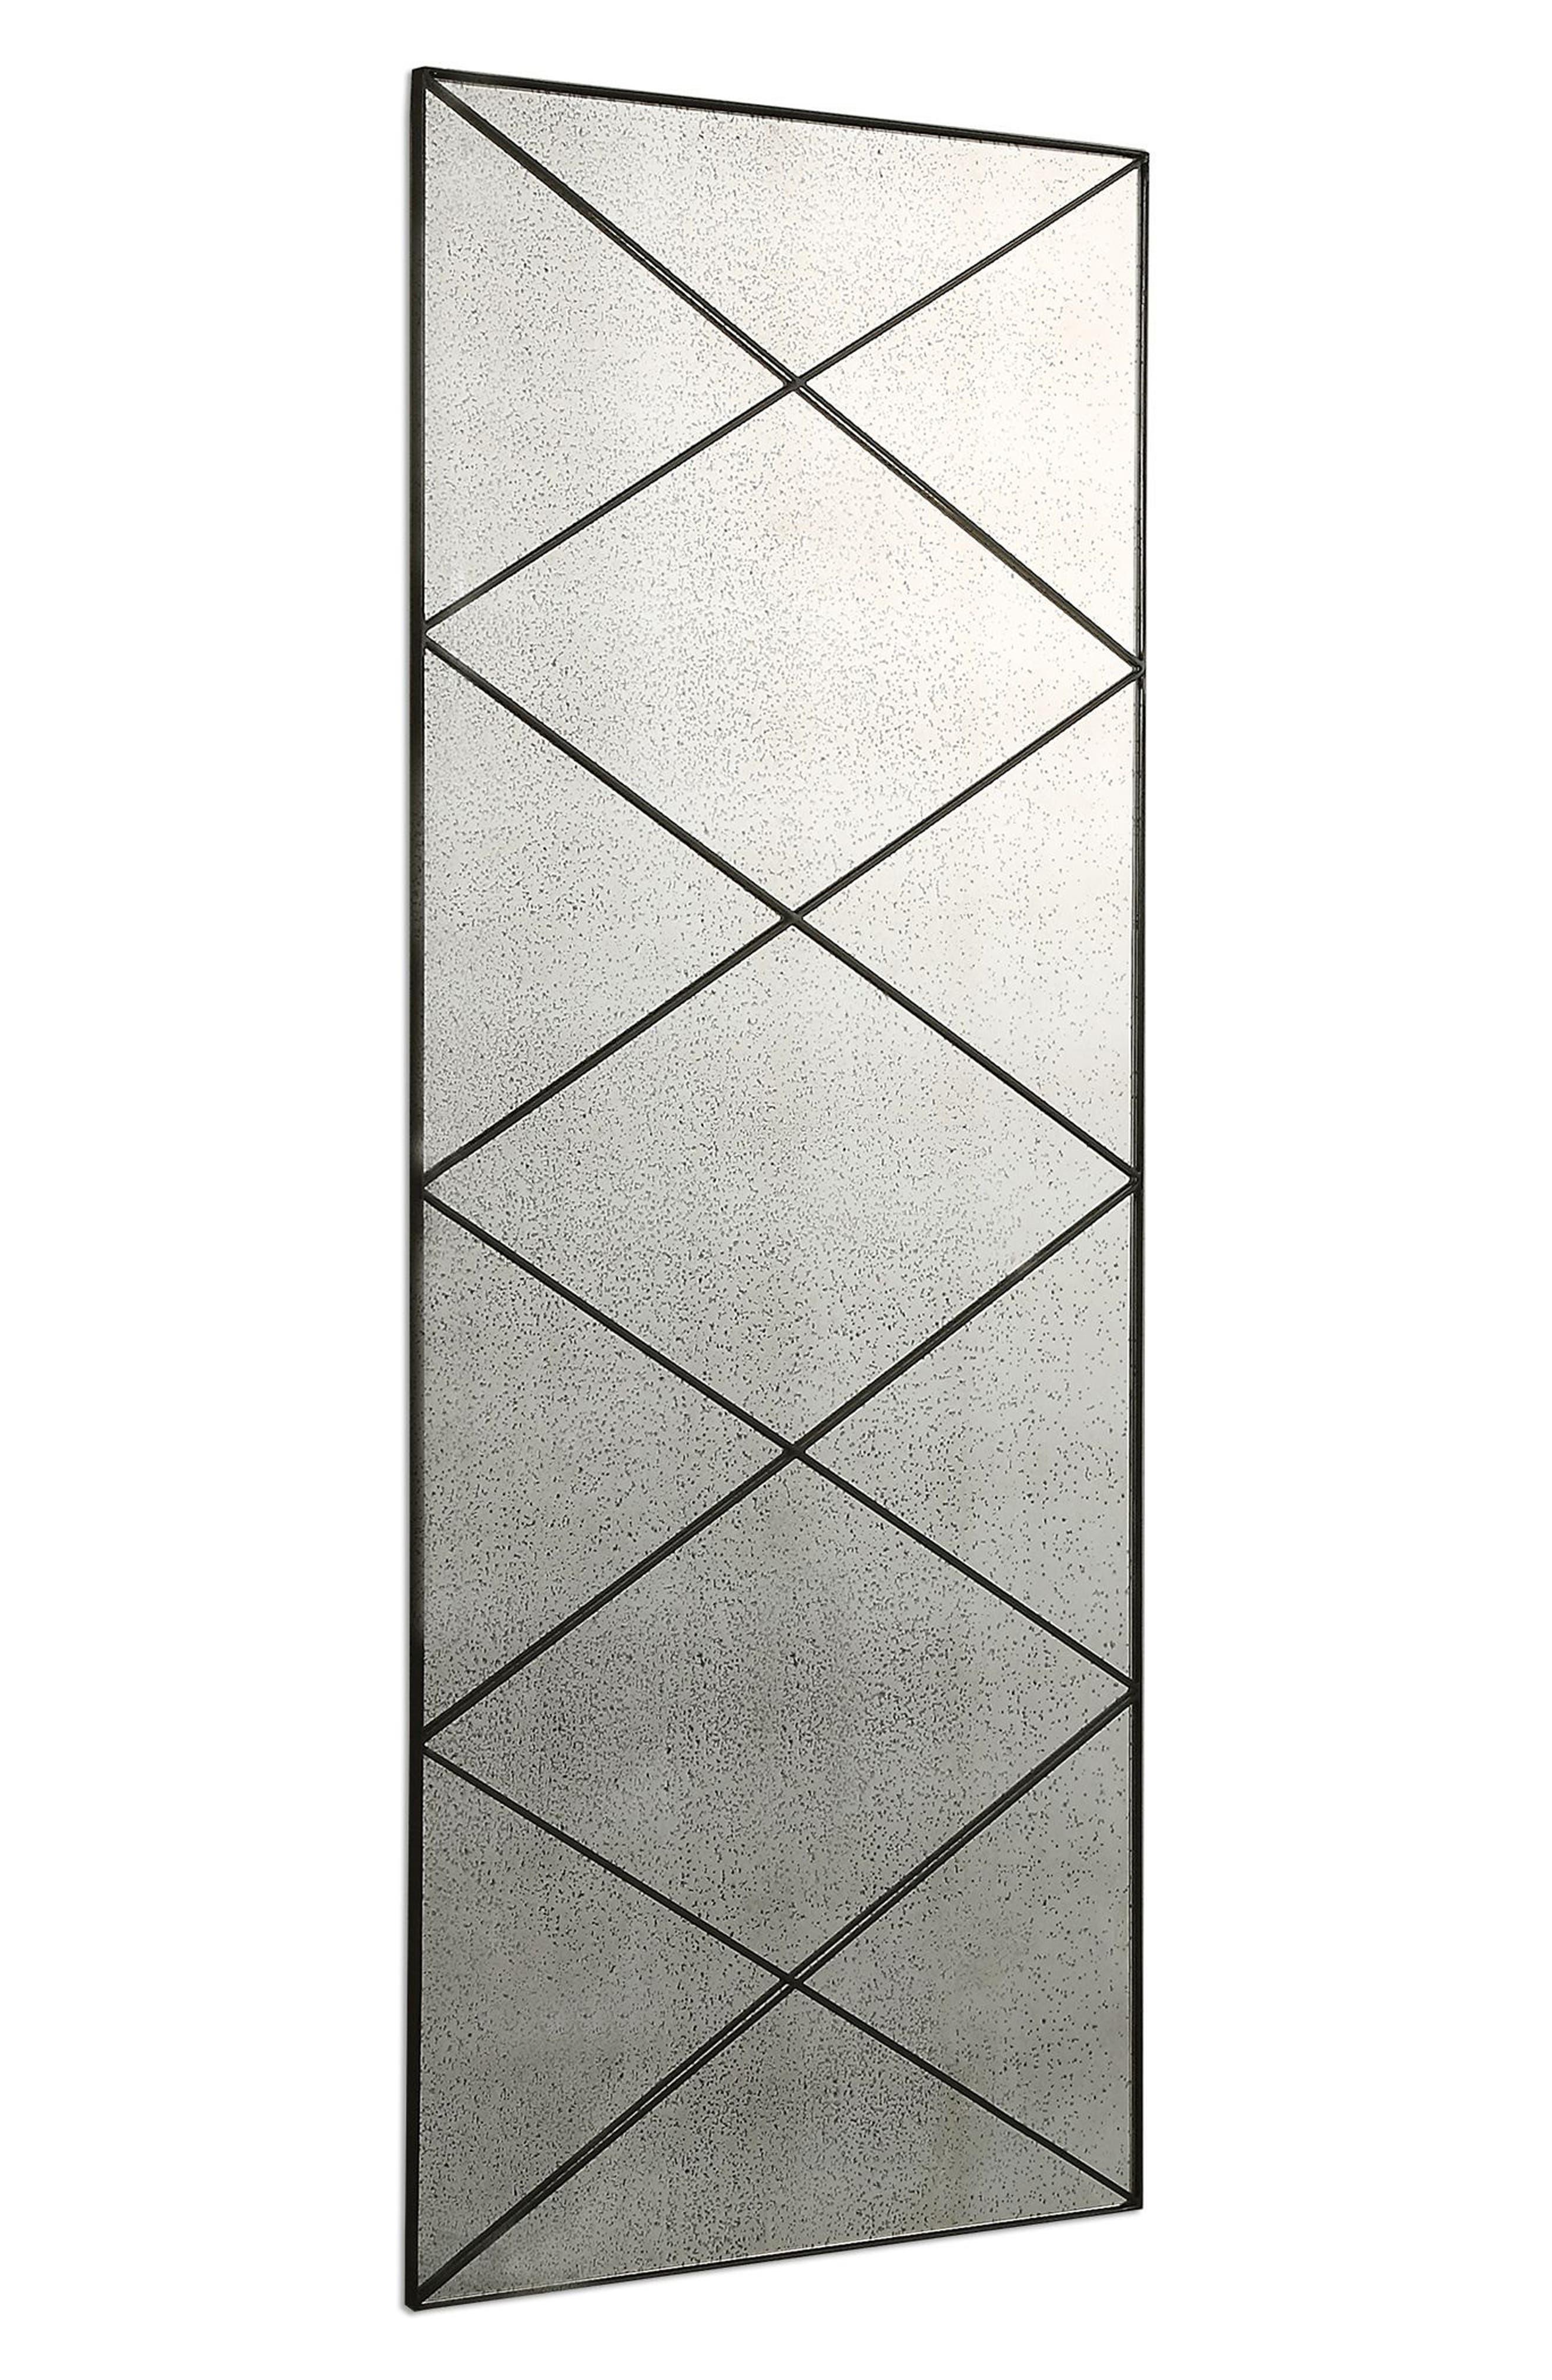 Emporia Wall Mirror,                             Alternate thumbnail 2, color,                             020